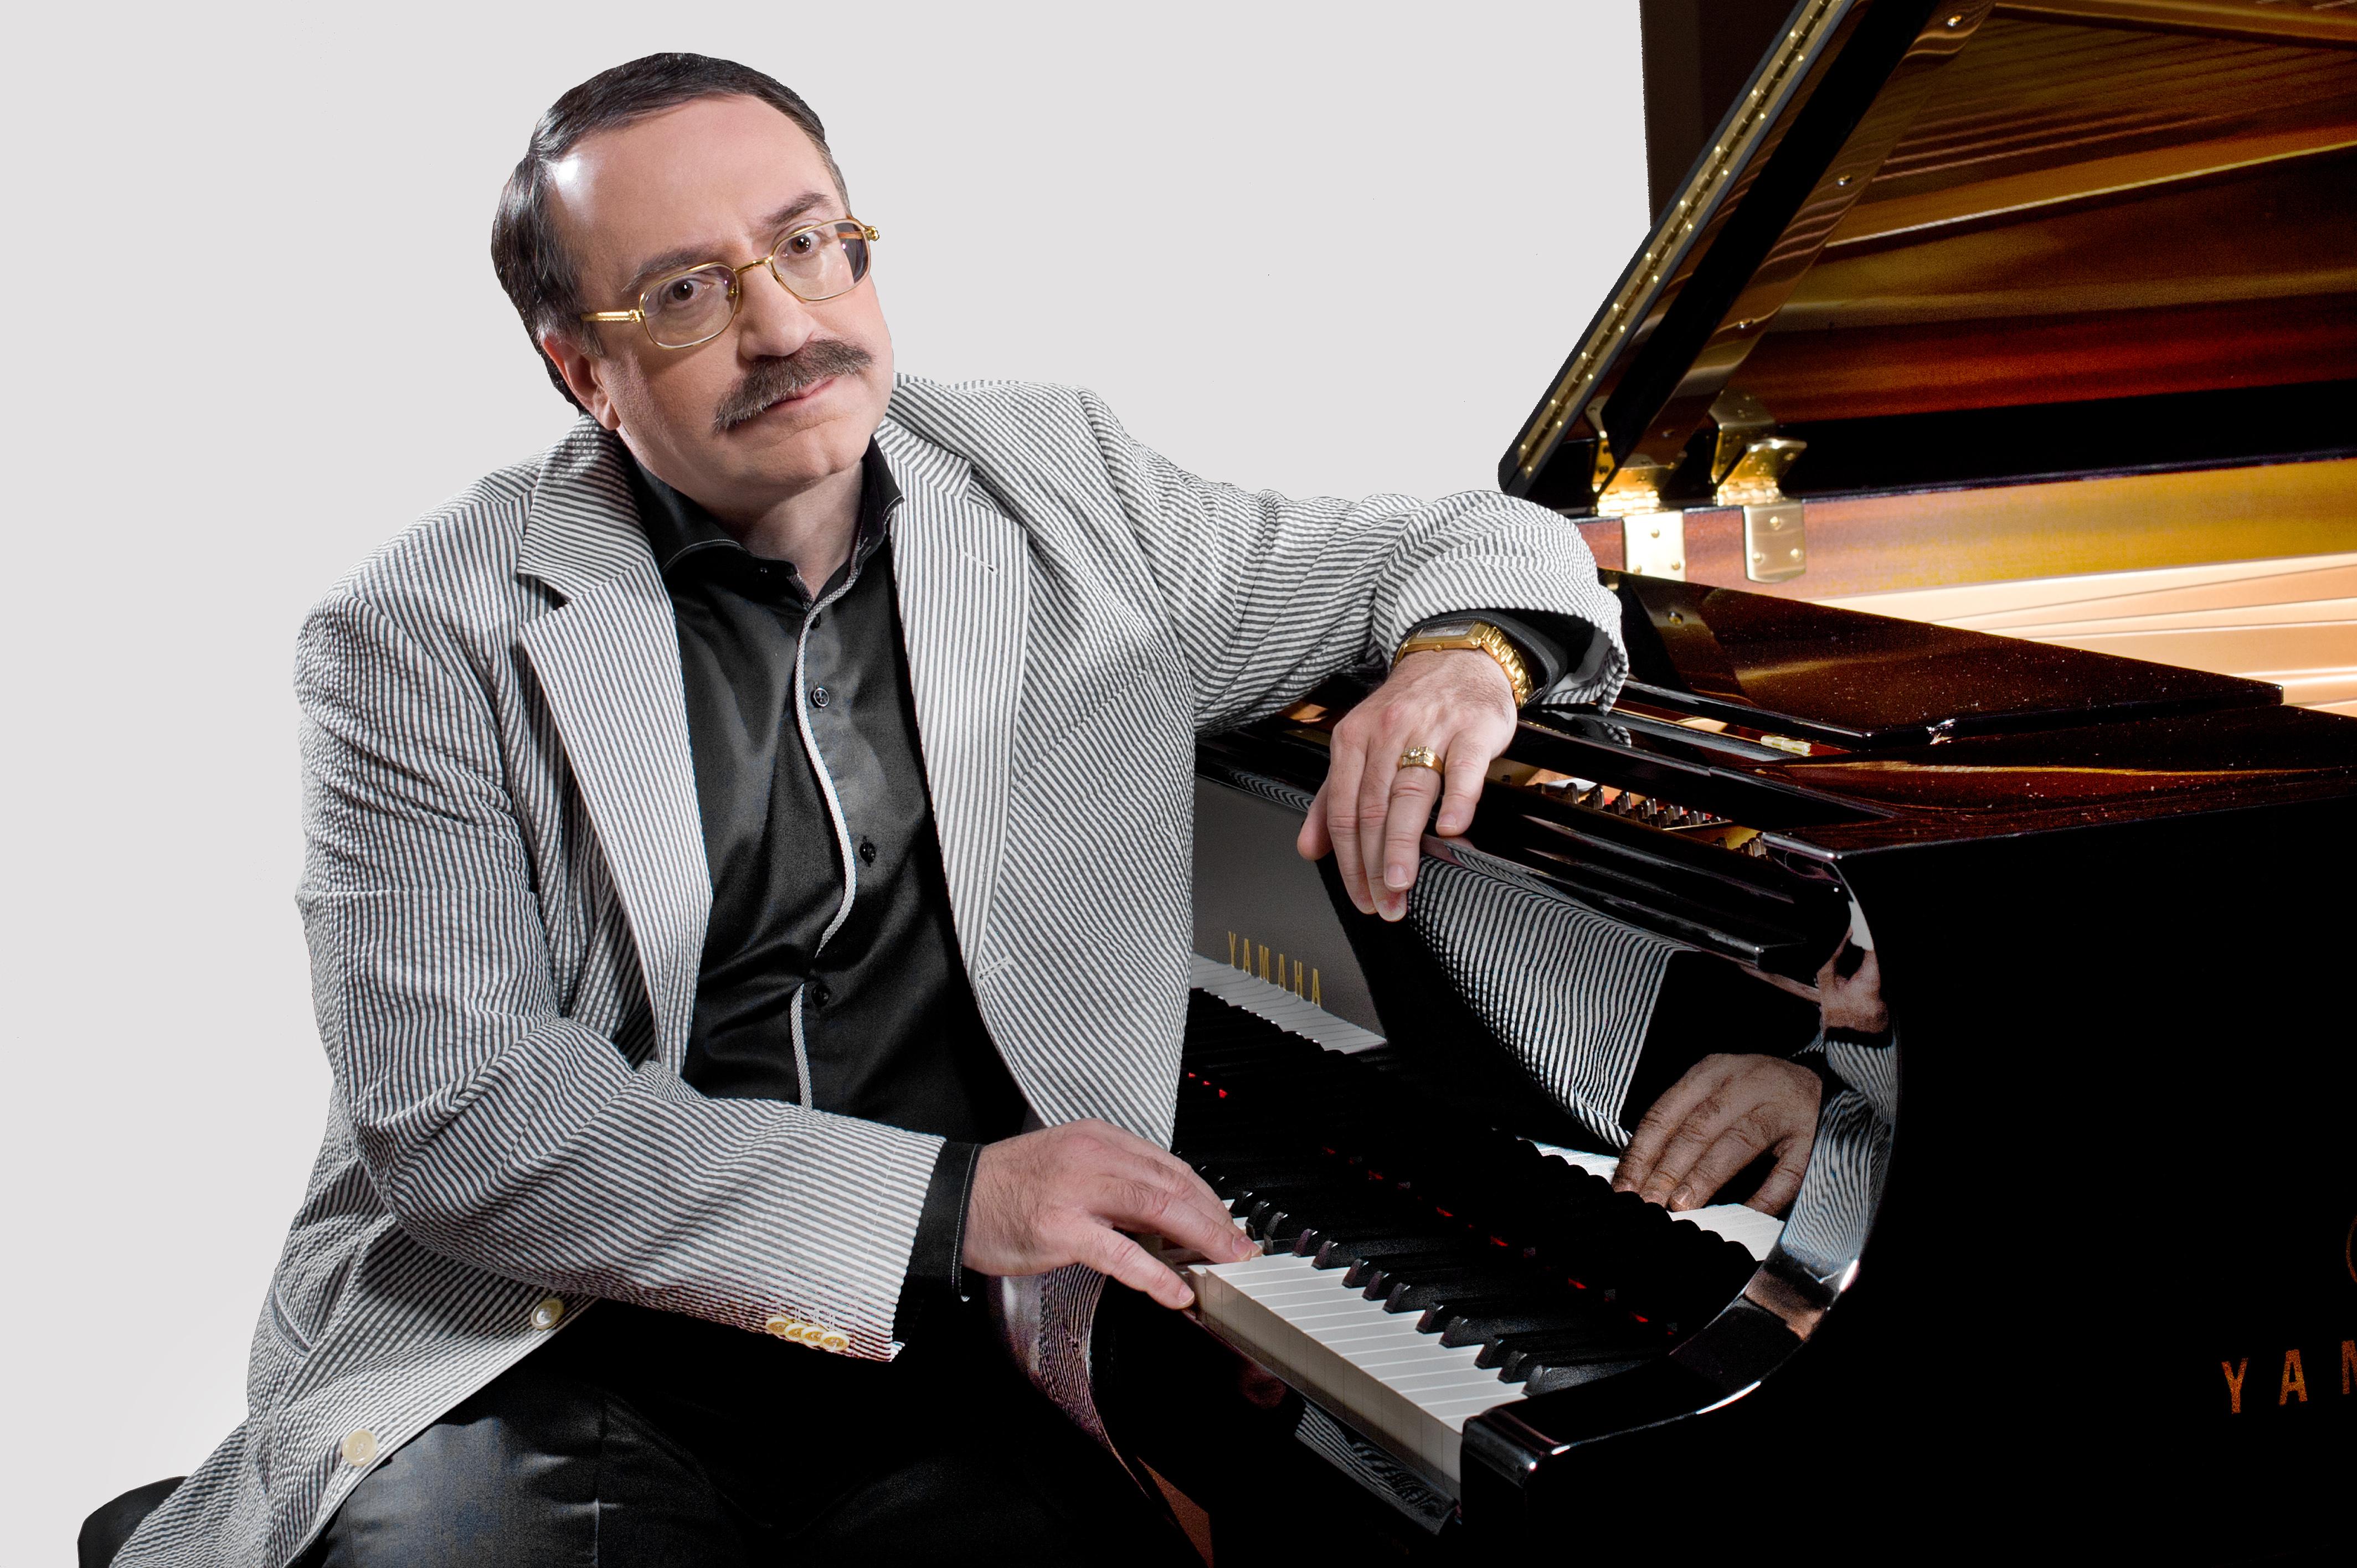 Мастера фортепианного джаза. Даниил Крамер, Контрабас ...: http://www.jazzmap.ru/afisha/2017-03-17-filarmoniya-2-v-olimpiiskoi-derevne-mastera-fortepiannogo-djaza-daniil-kramer.php